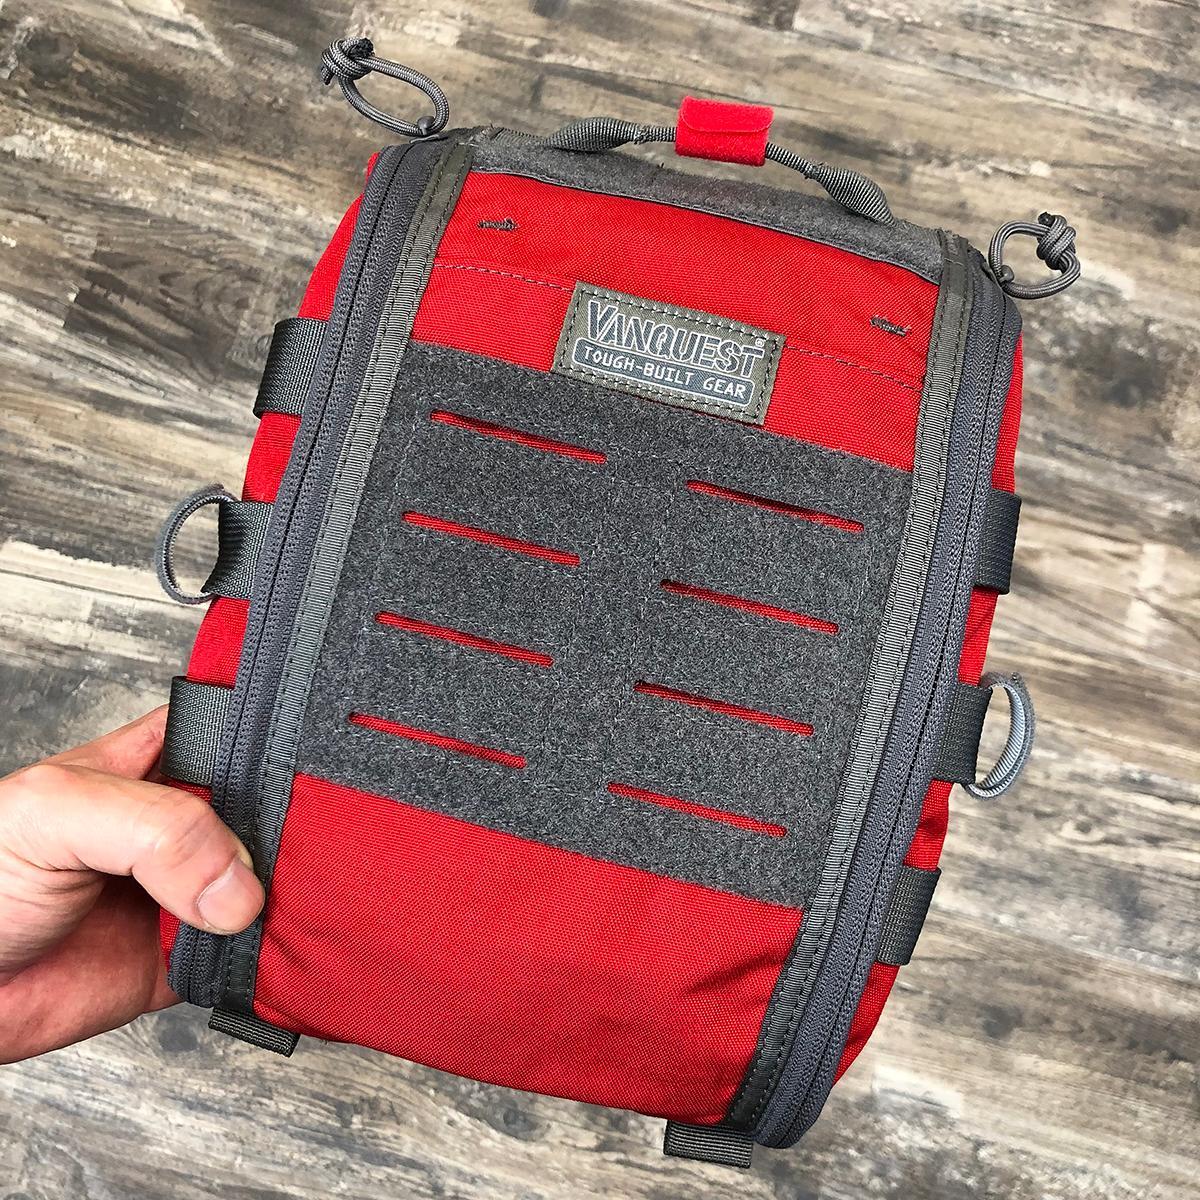 Fatpack 7X10 (Gen-2) First Aid Trauma Pack - Rot